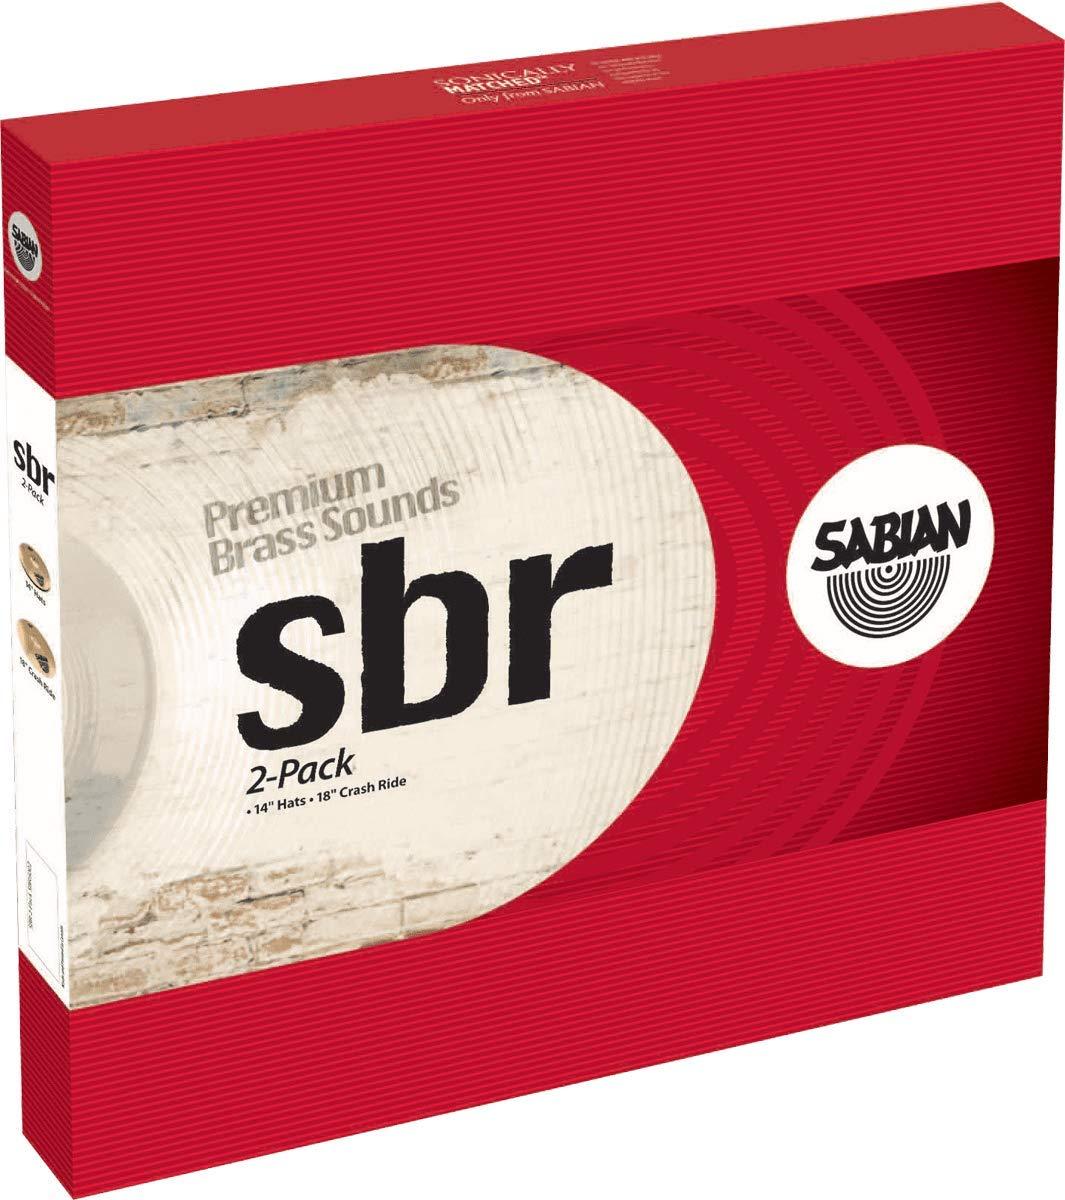 Sabian Cymbals SBR5002 SBR 2-Pack 14'' Hi hats, 18'' Crash/Ride by Sabian